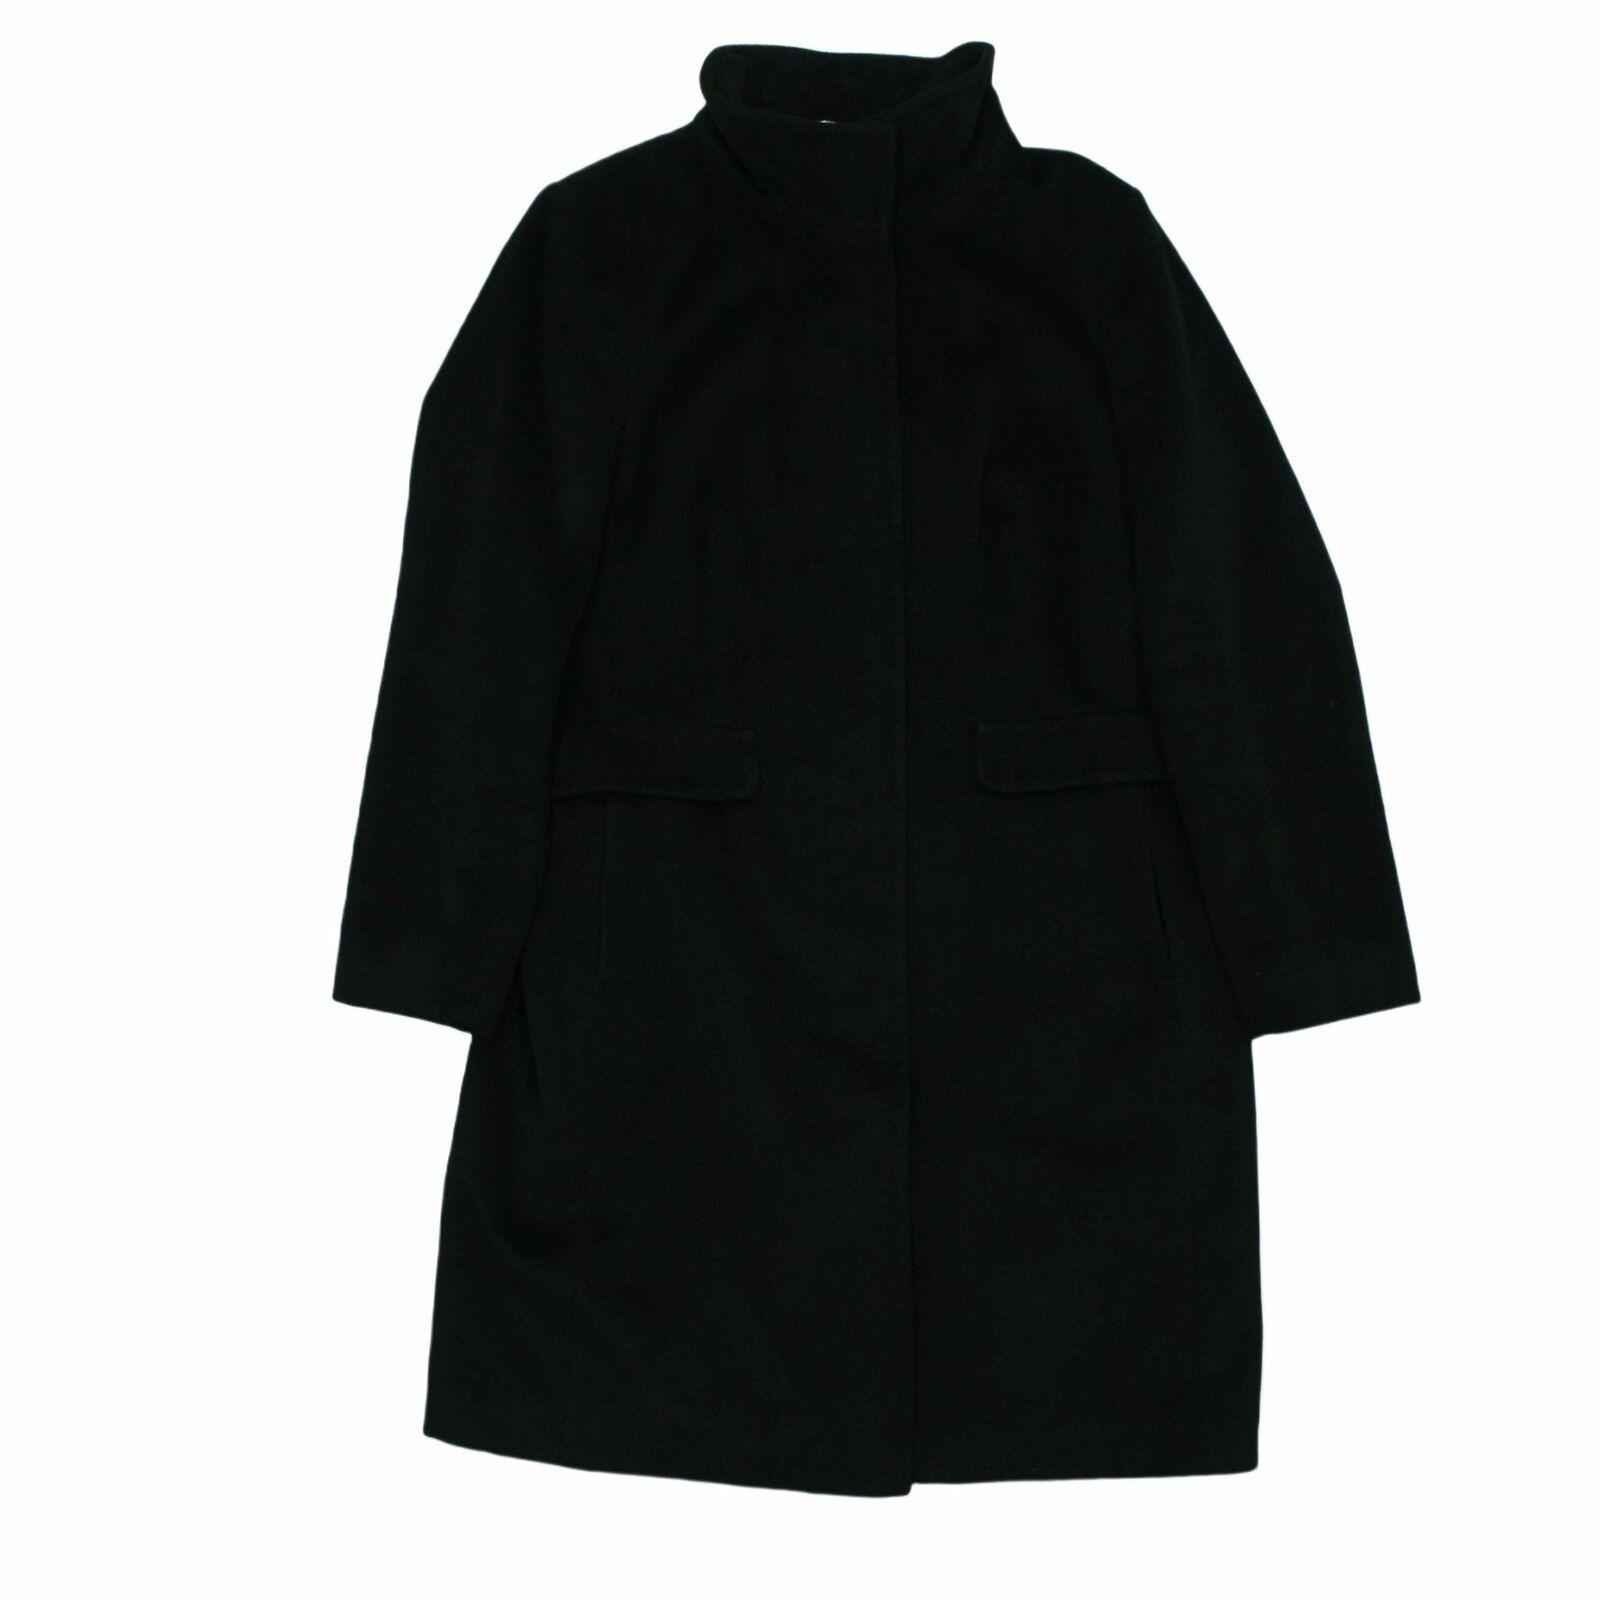 Autograph Women's Coat 16 Black Blend - wool, other